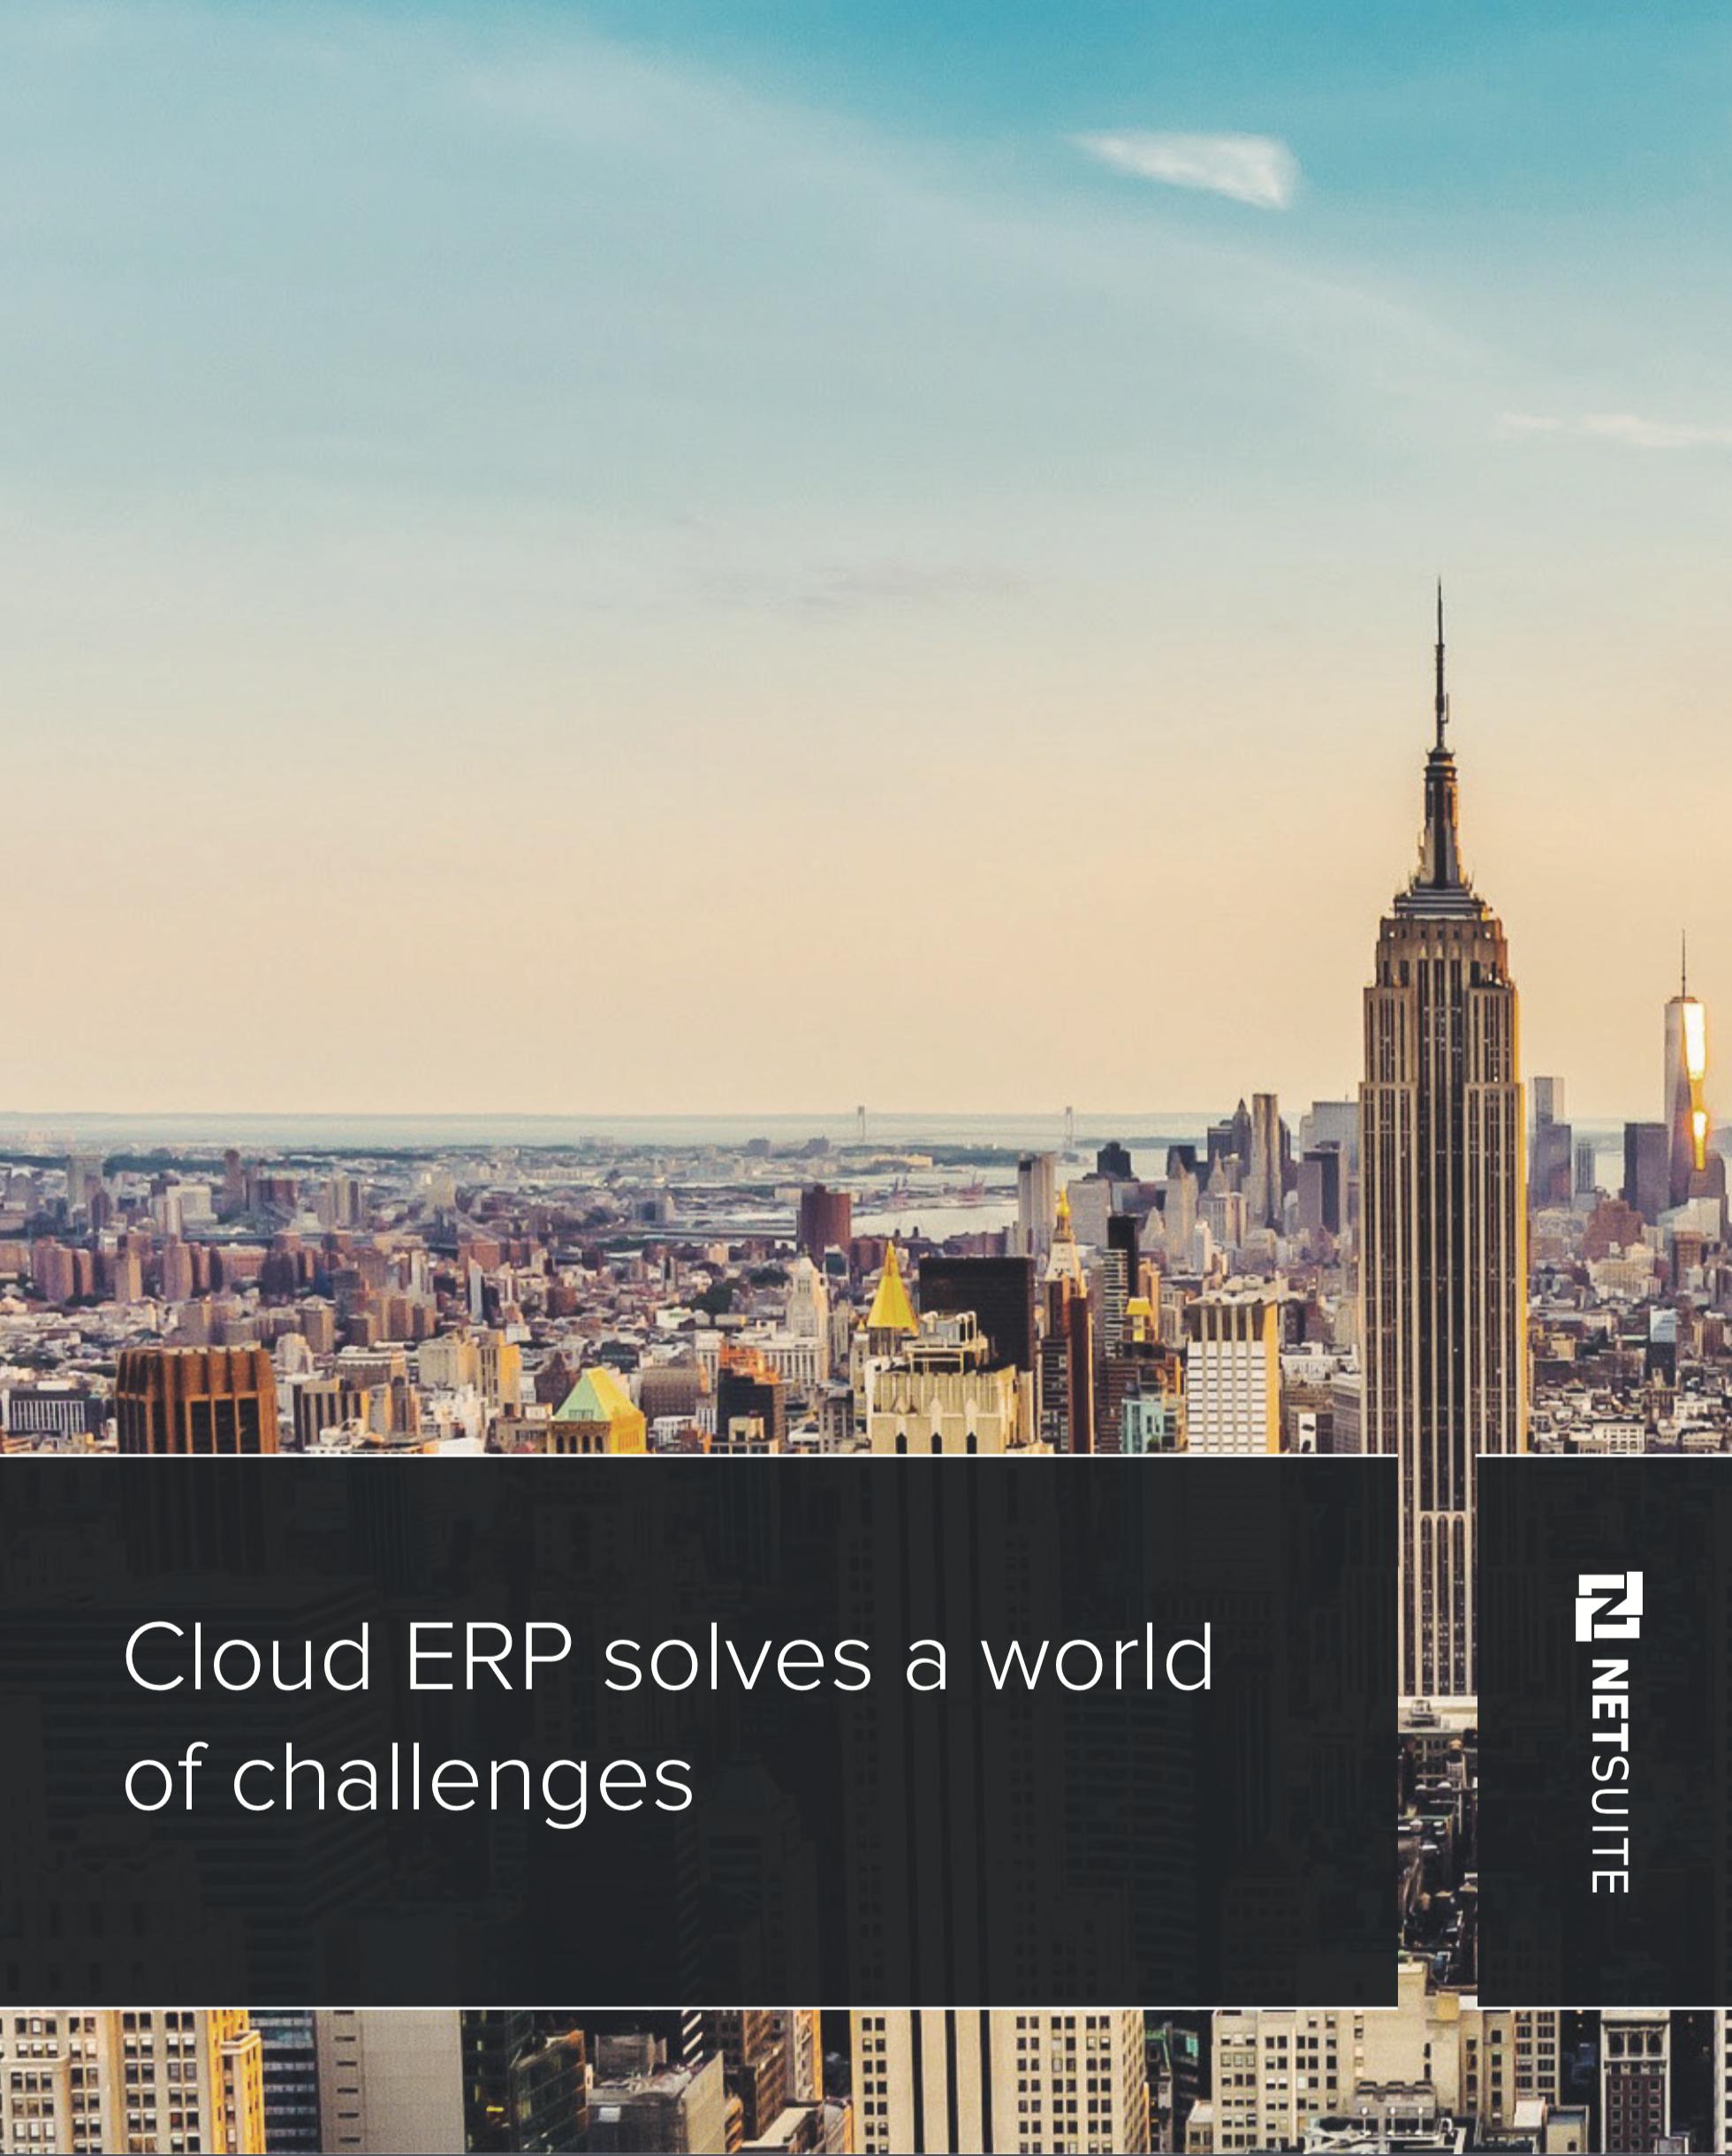 Cloud ERP solves a world of challenges - Case studies